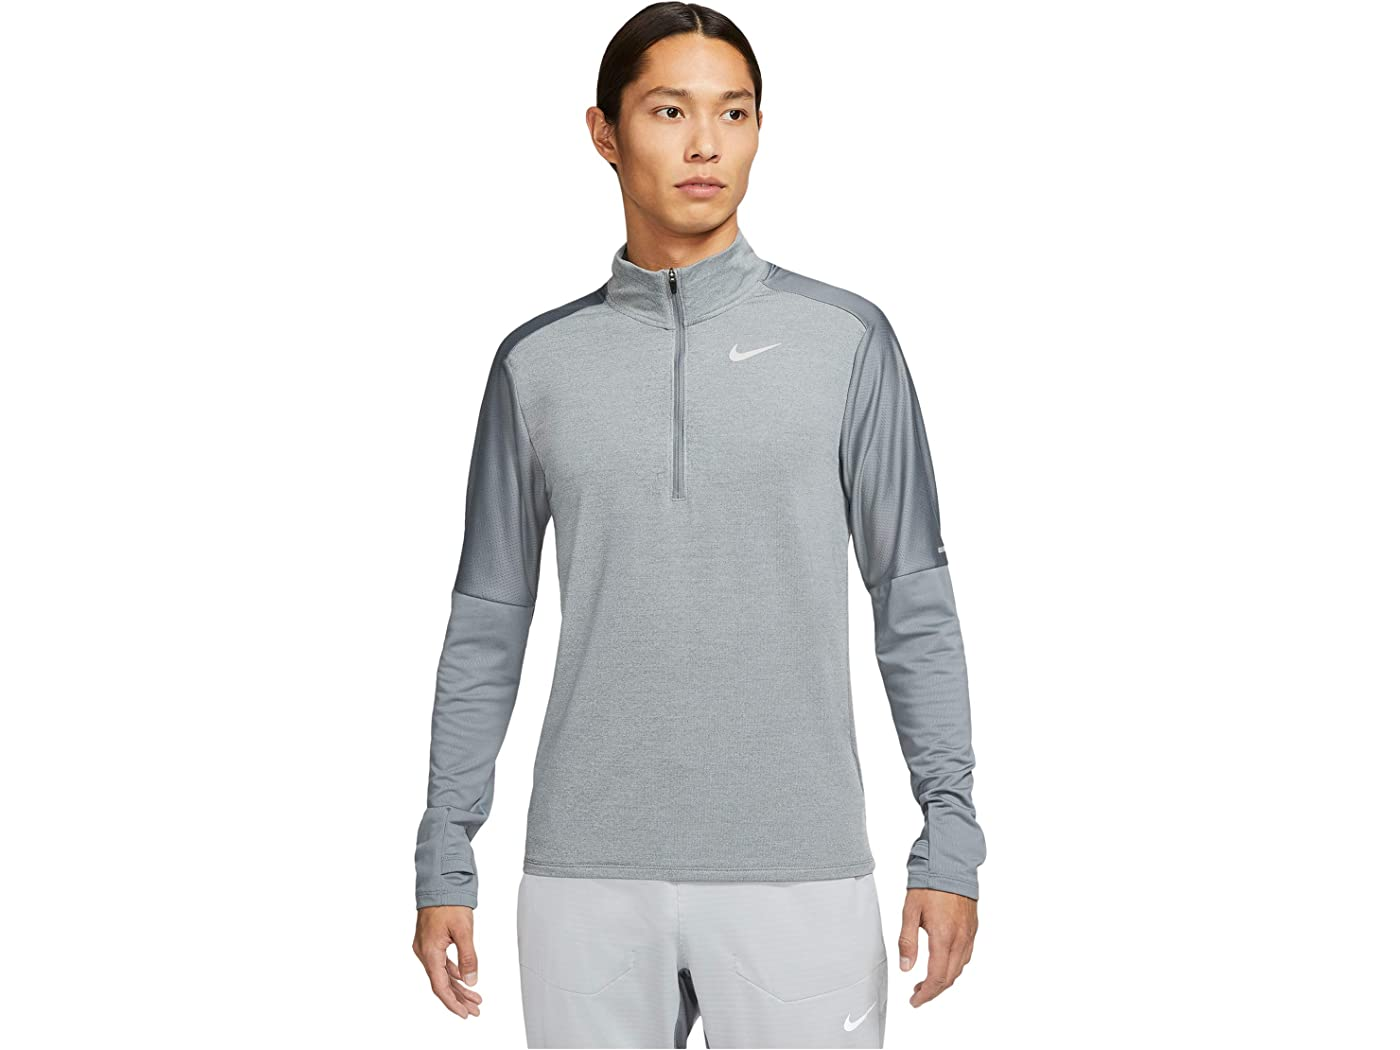 Nike Dri-Fit Element Top 1/2 Zip